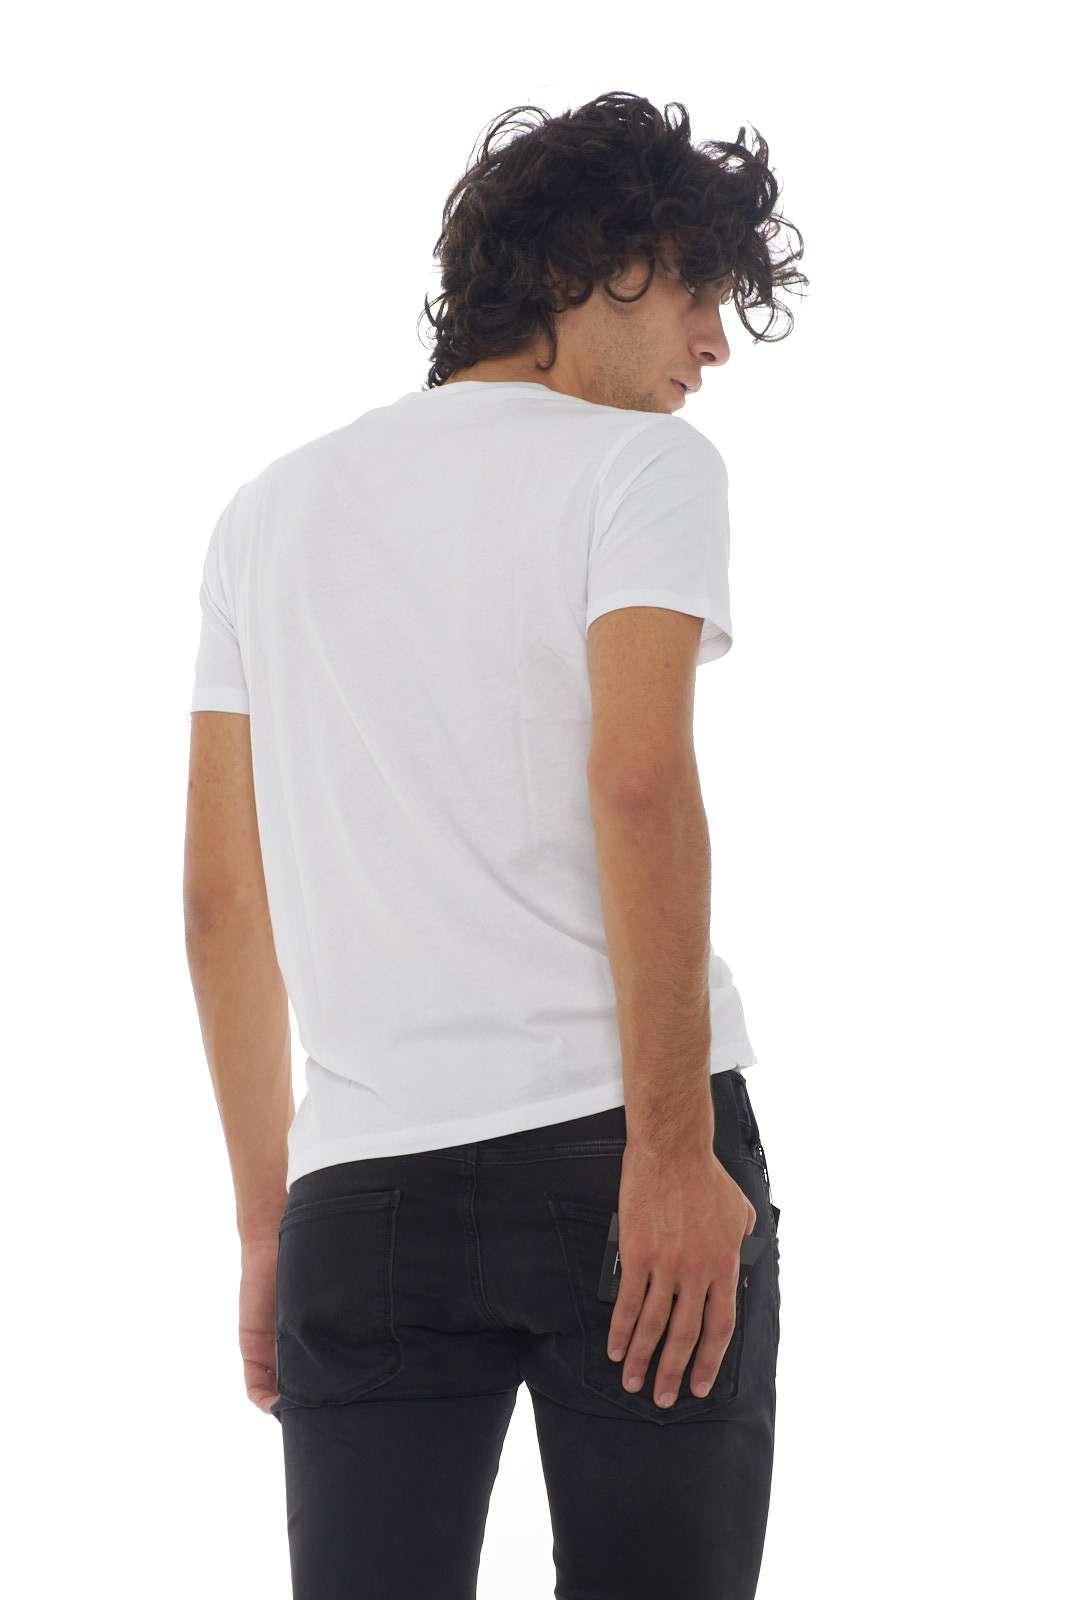 https://www.parmax.com/media/catalog/product/a/i/AI-Outlet_Parmax-Tshirt-Uomo-Raplay-M3858%20000-C.jpg